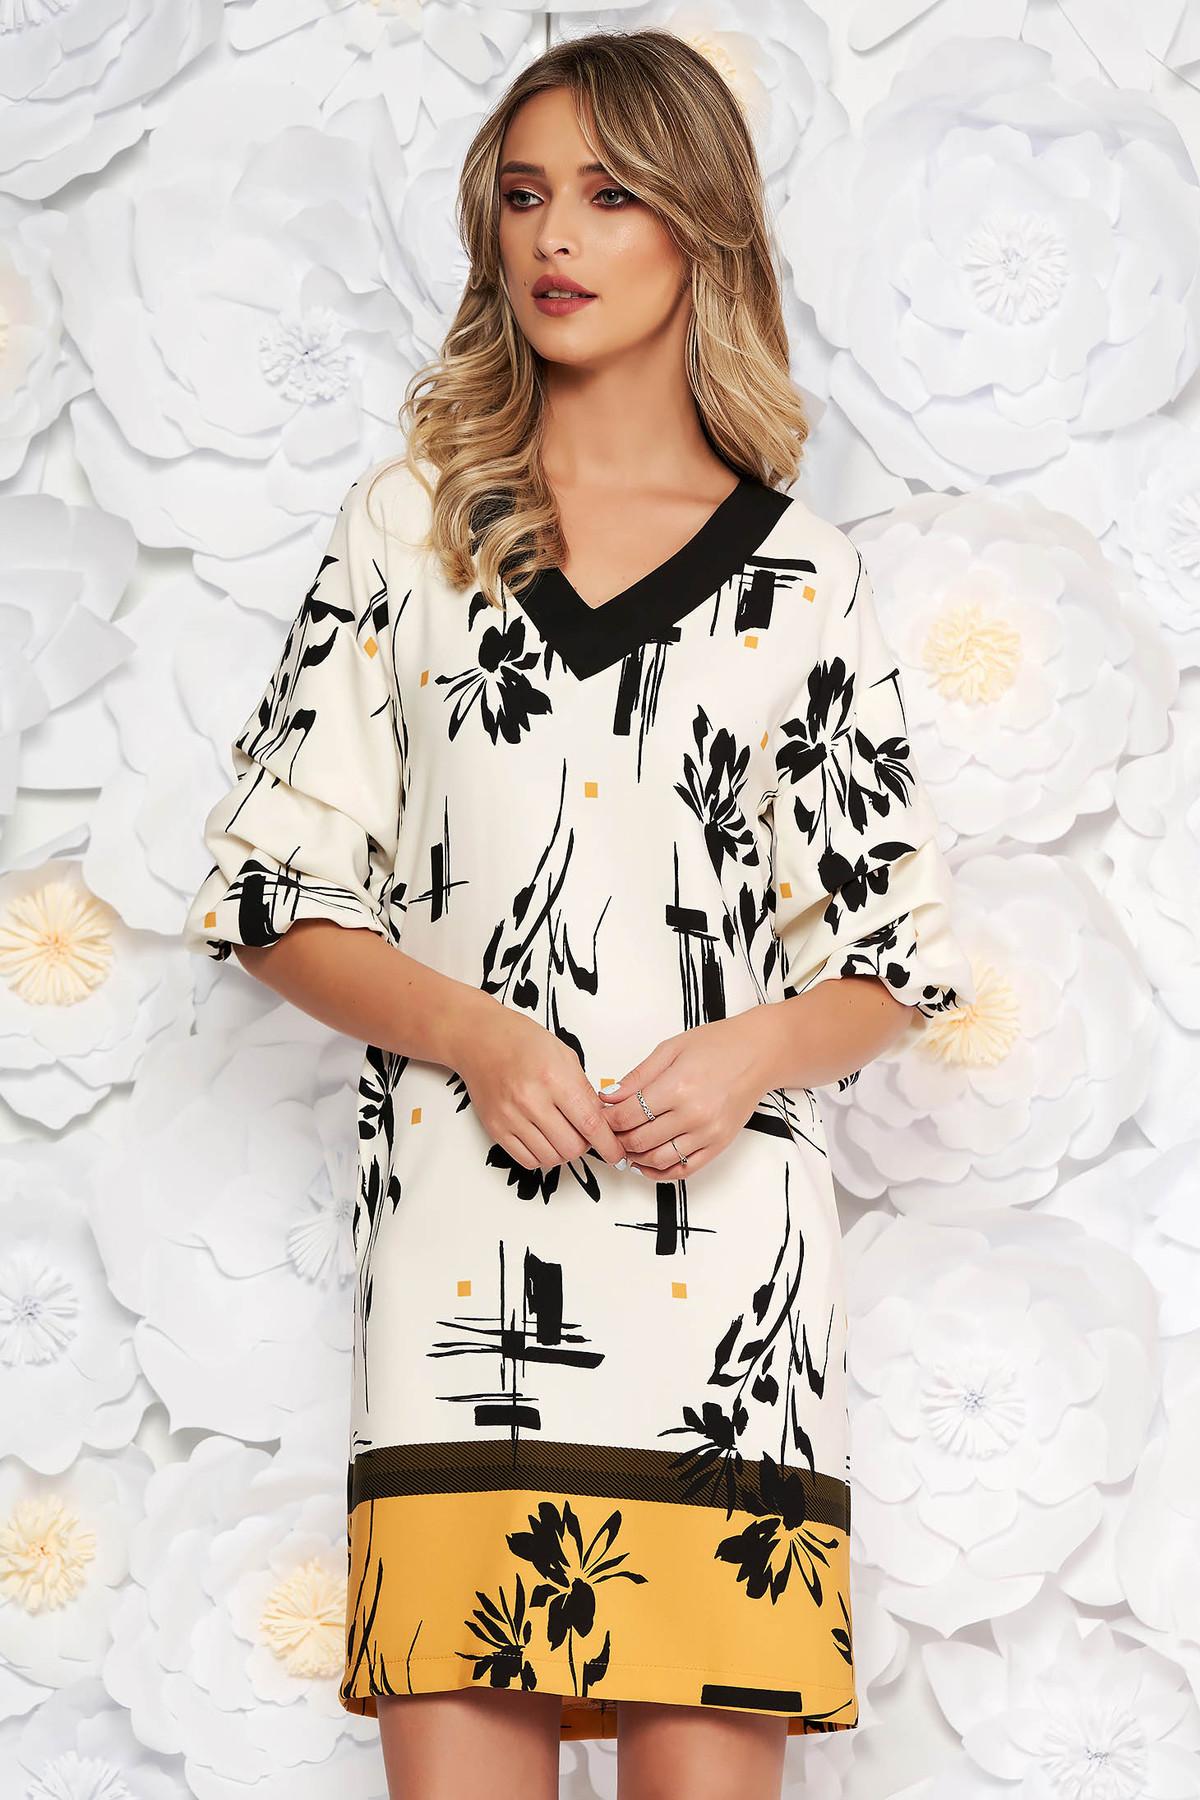 Rochie LaDonna alba cu accente mustarii eleganta de zi cu un croi drept cu maneca 3/4 din material usor elastic cu imprimeuri florale